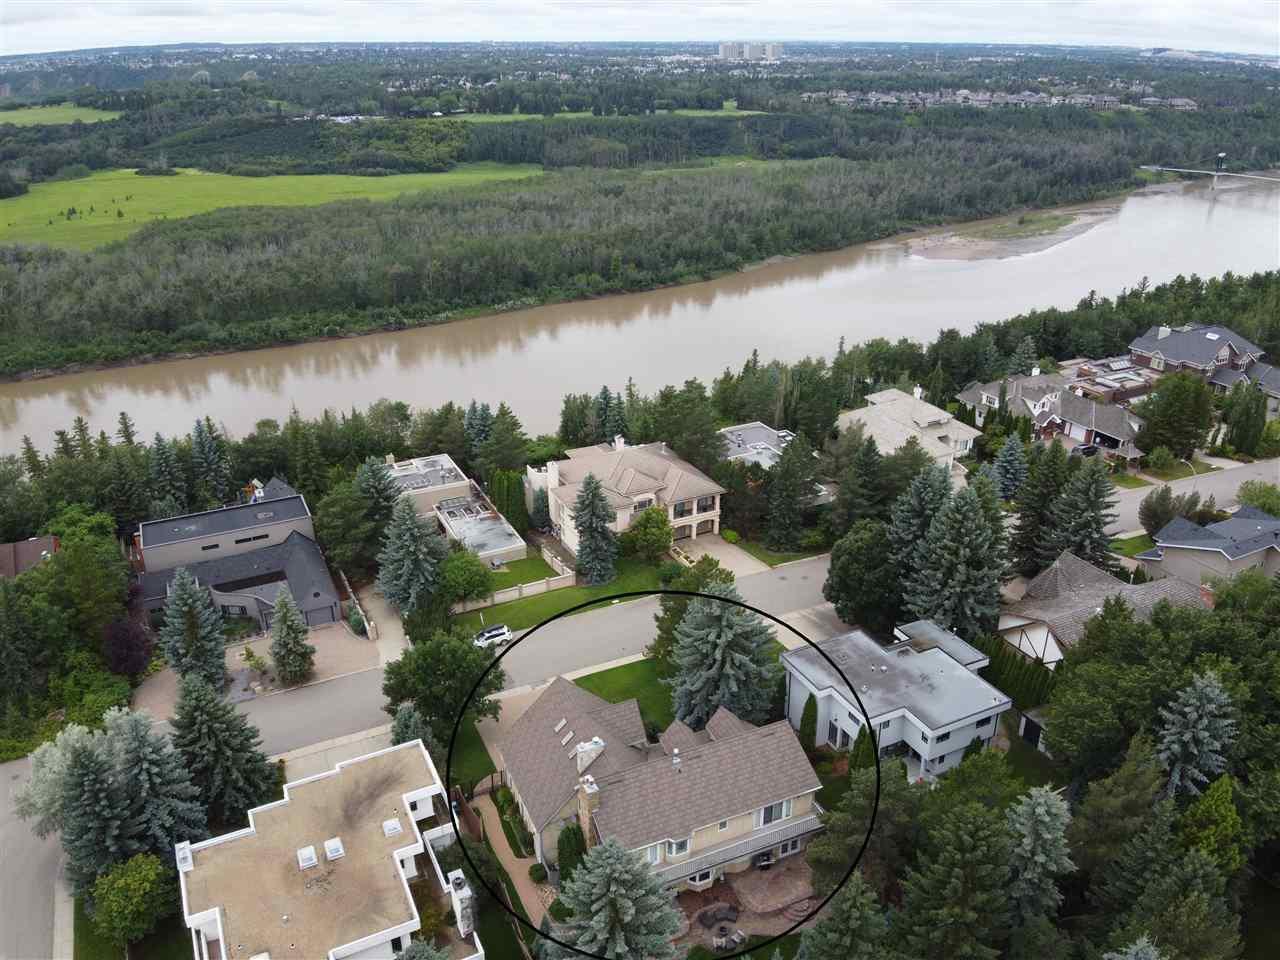 Main Photo: 5009 154 Street in Edmonton: Zone 14 House for sale : MLS®# E4207611